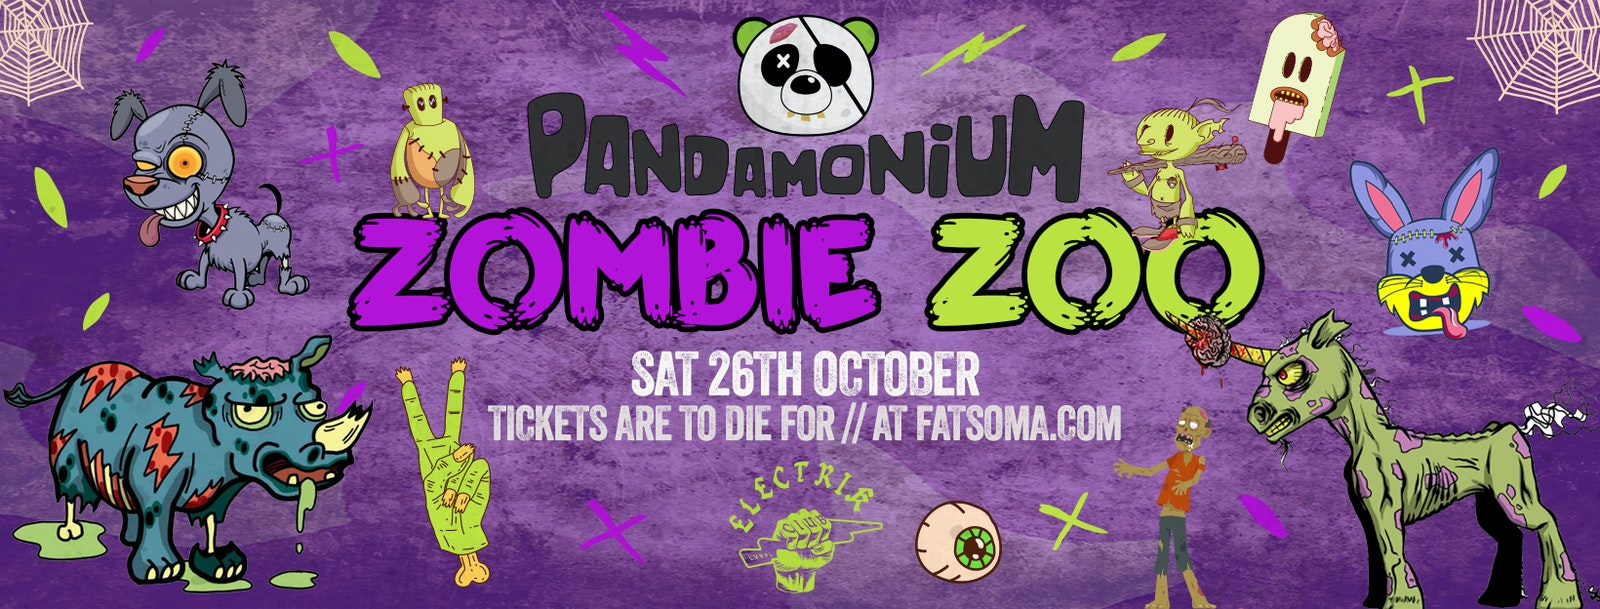 Pandamonium Saturdays presents the ZOMBIE ZOO Halloween Special